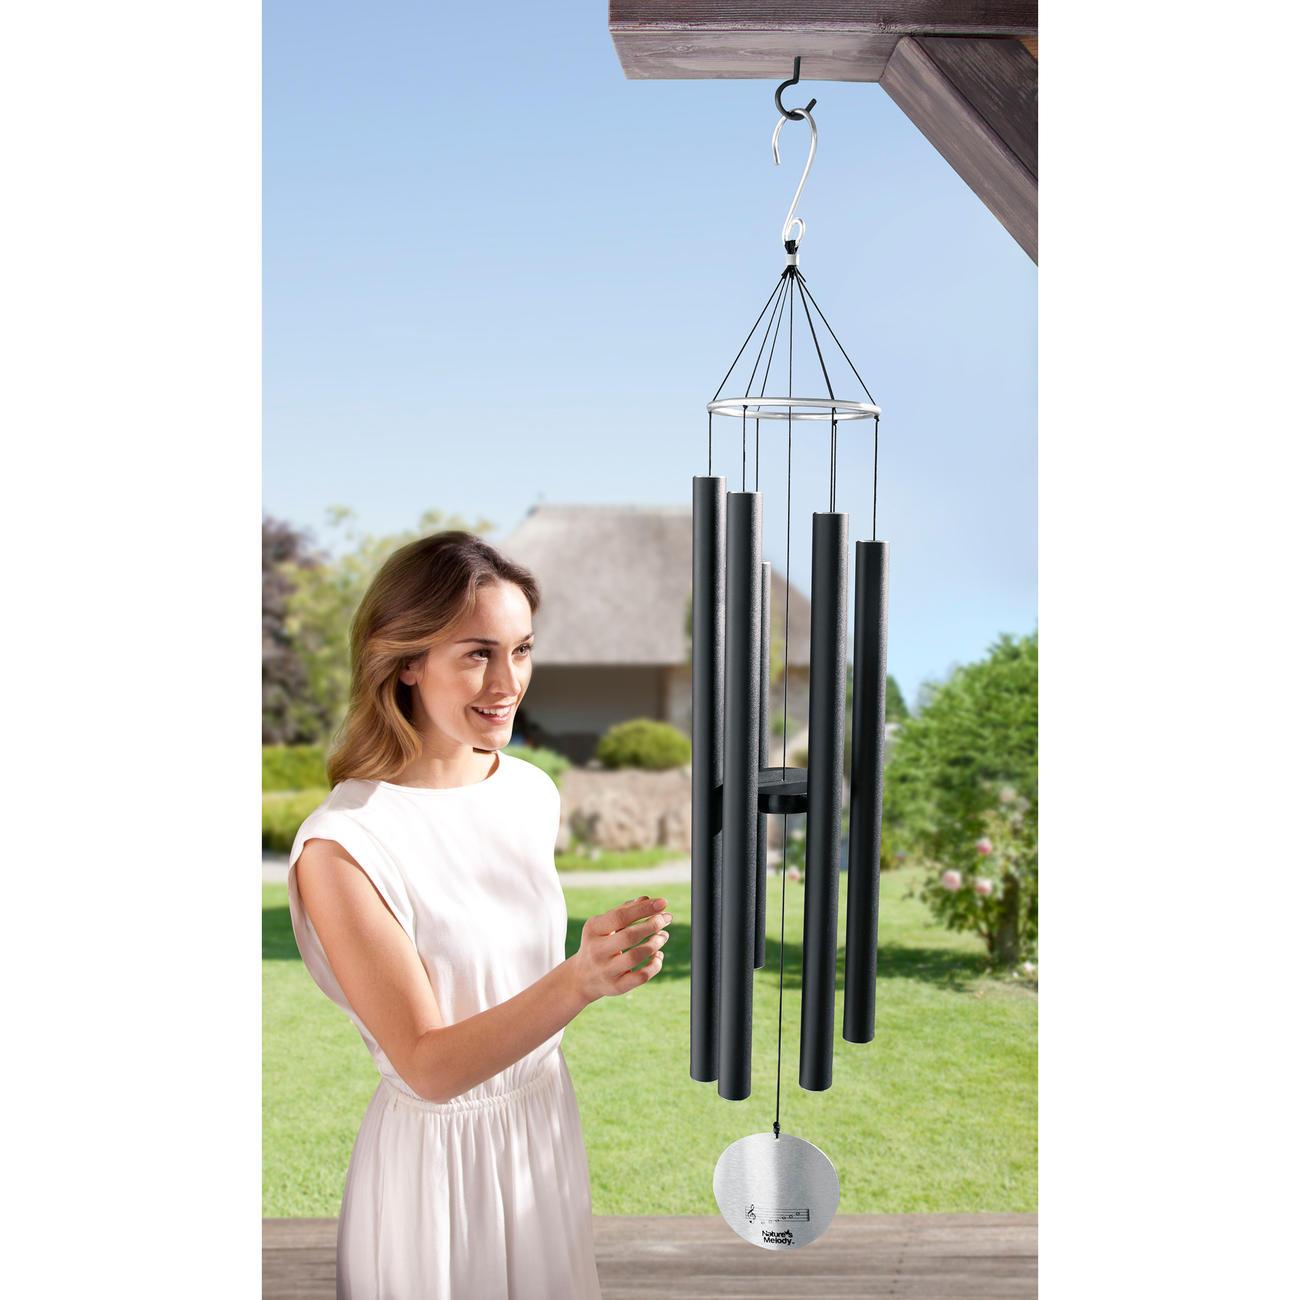 grand carillon vent garantie produit de 3 ans. Black Bedroom Furniture Sets. Home Design Ideas